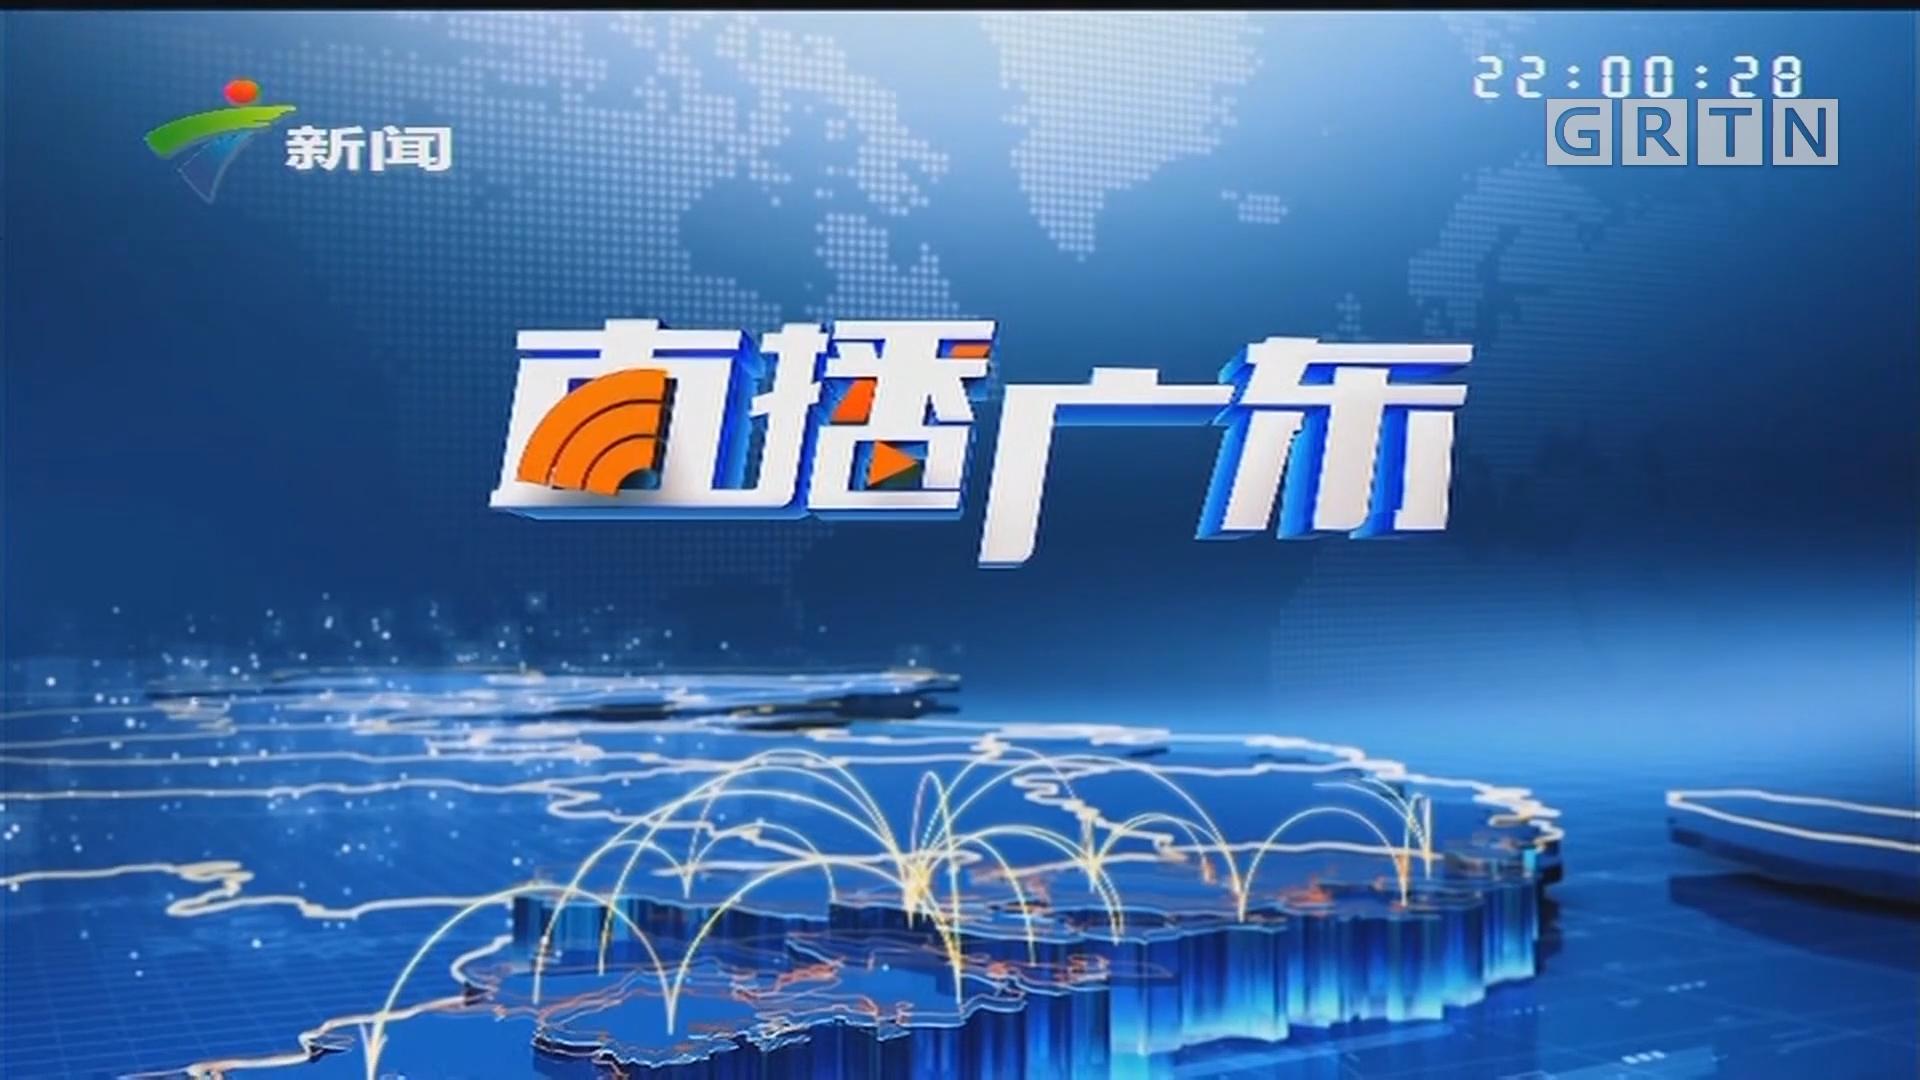 [HD][2019-12-12]直播广东:广东:多措并举严防火灾发生 森林防火刻不容缓